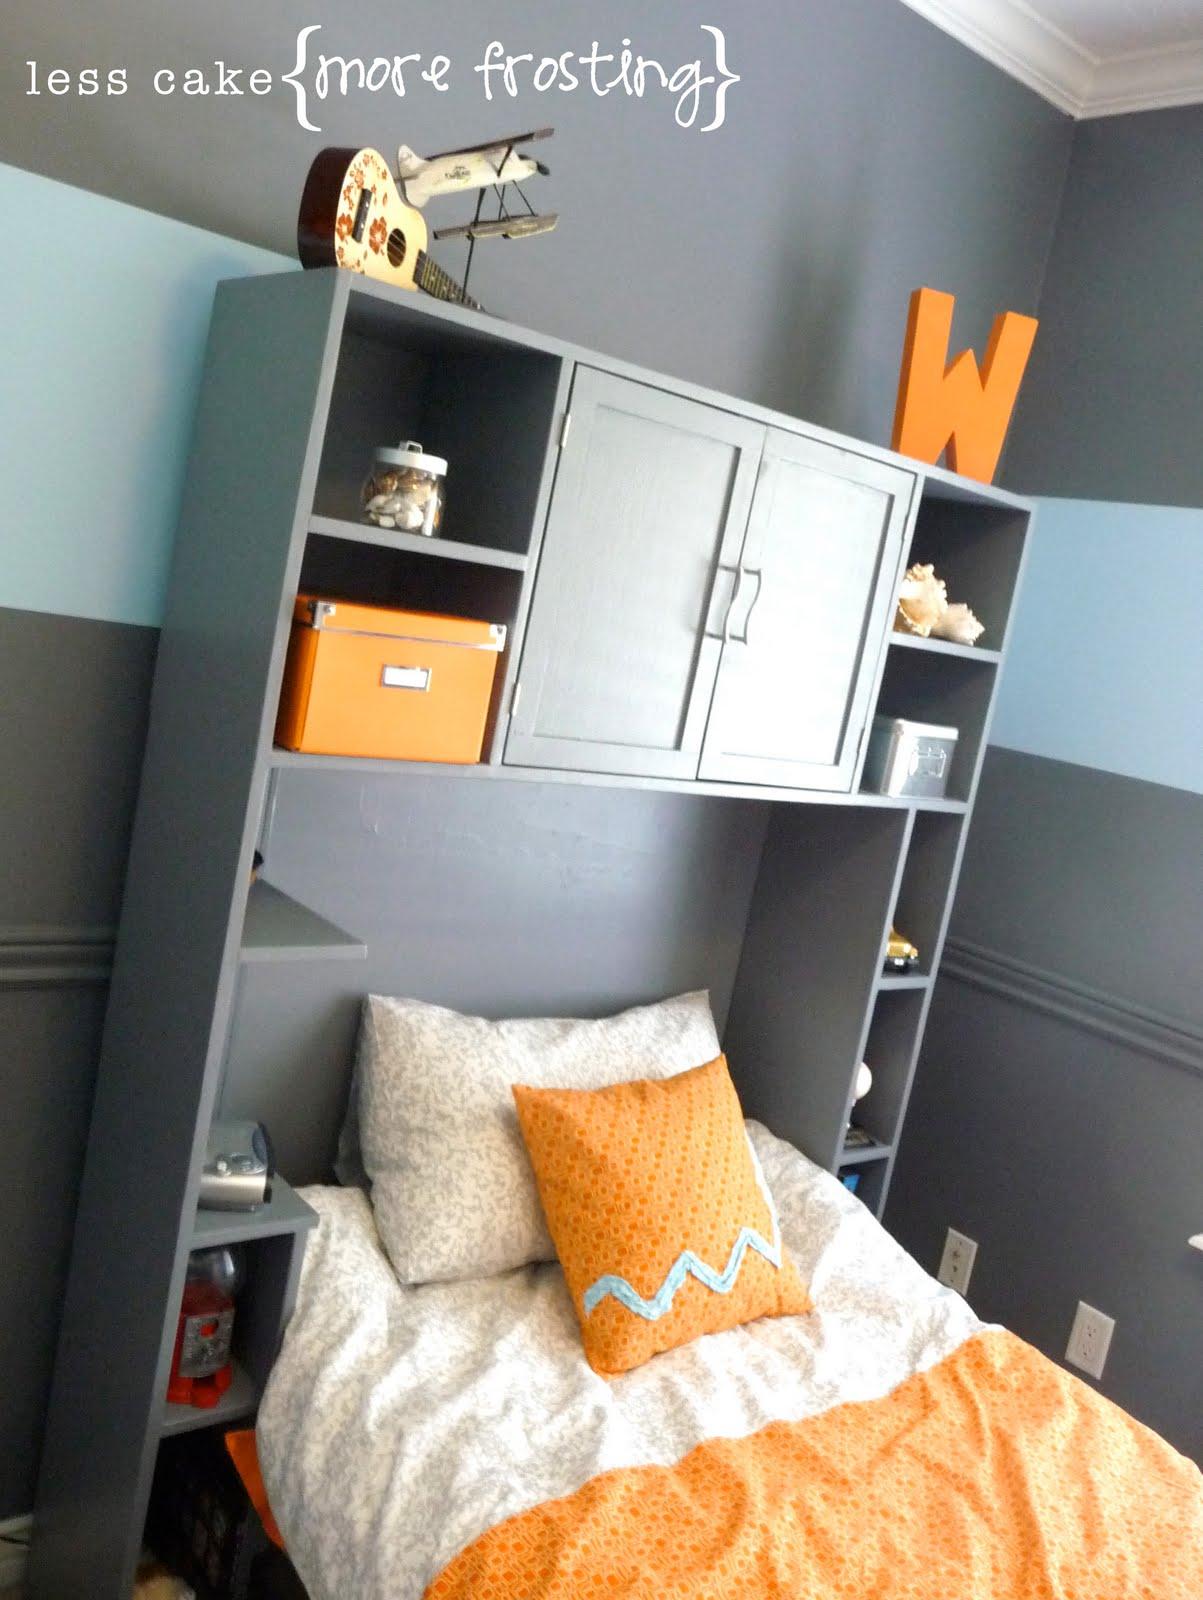 Boys Bedroom Interior Design Makeover. Remodelaholic   Boys Bedroom Interior Design Makeover